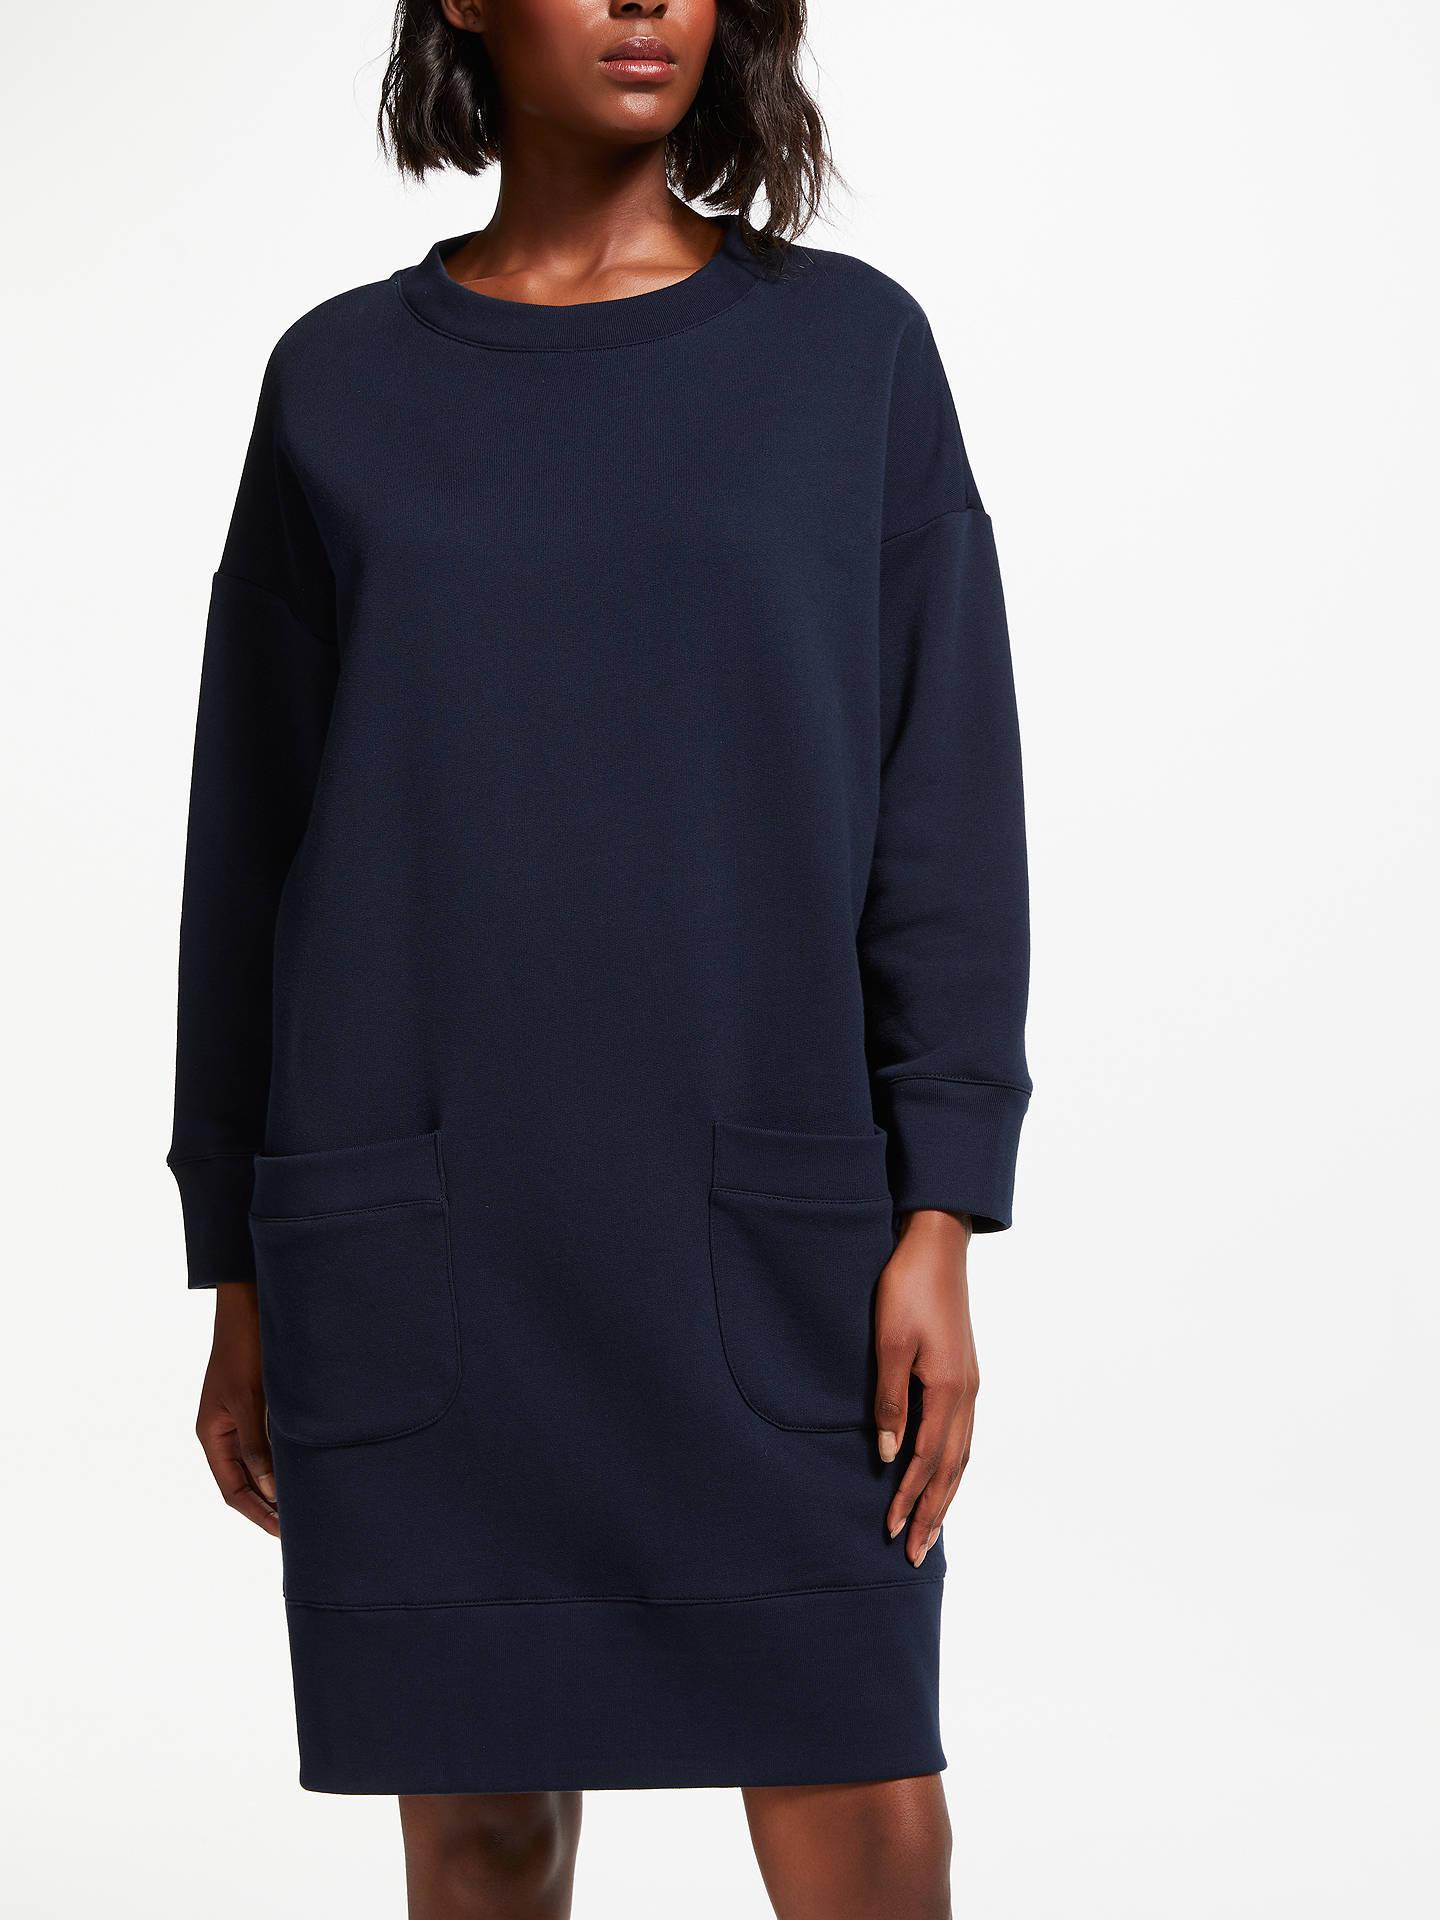 0a8e7ac7a9 Buy Kin Longline Sweatshirt Dress